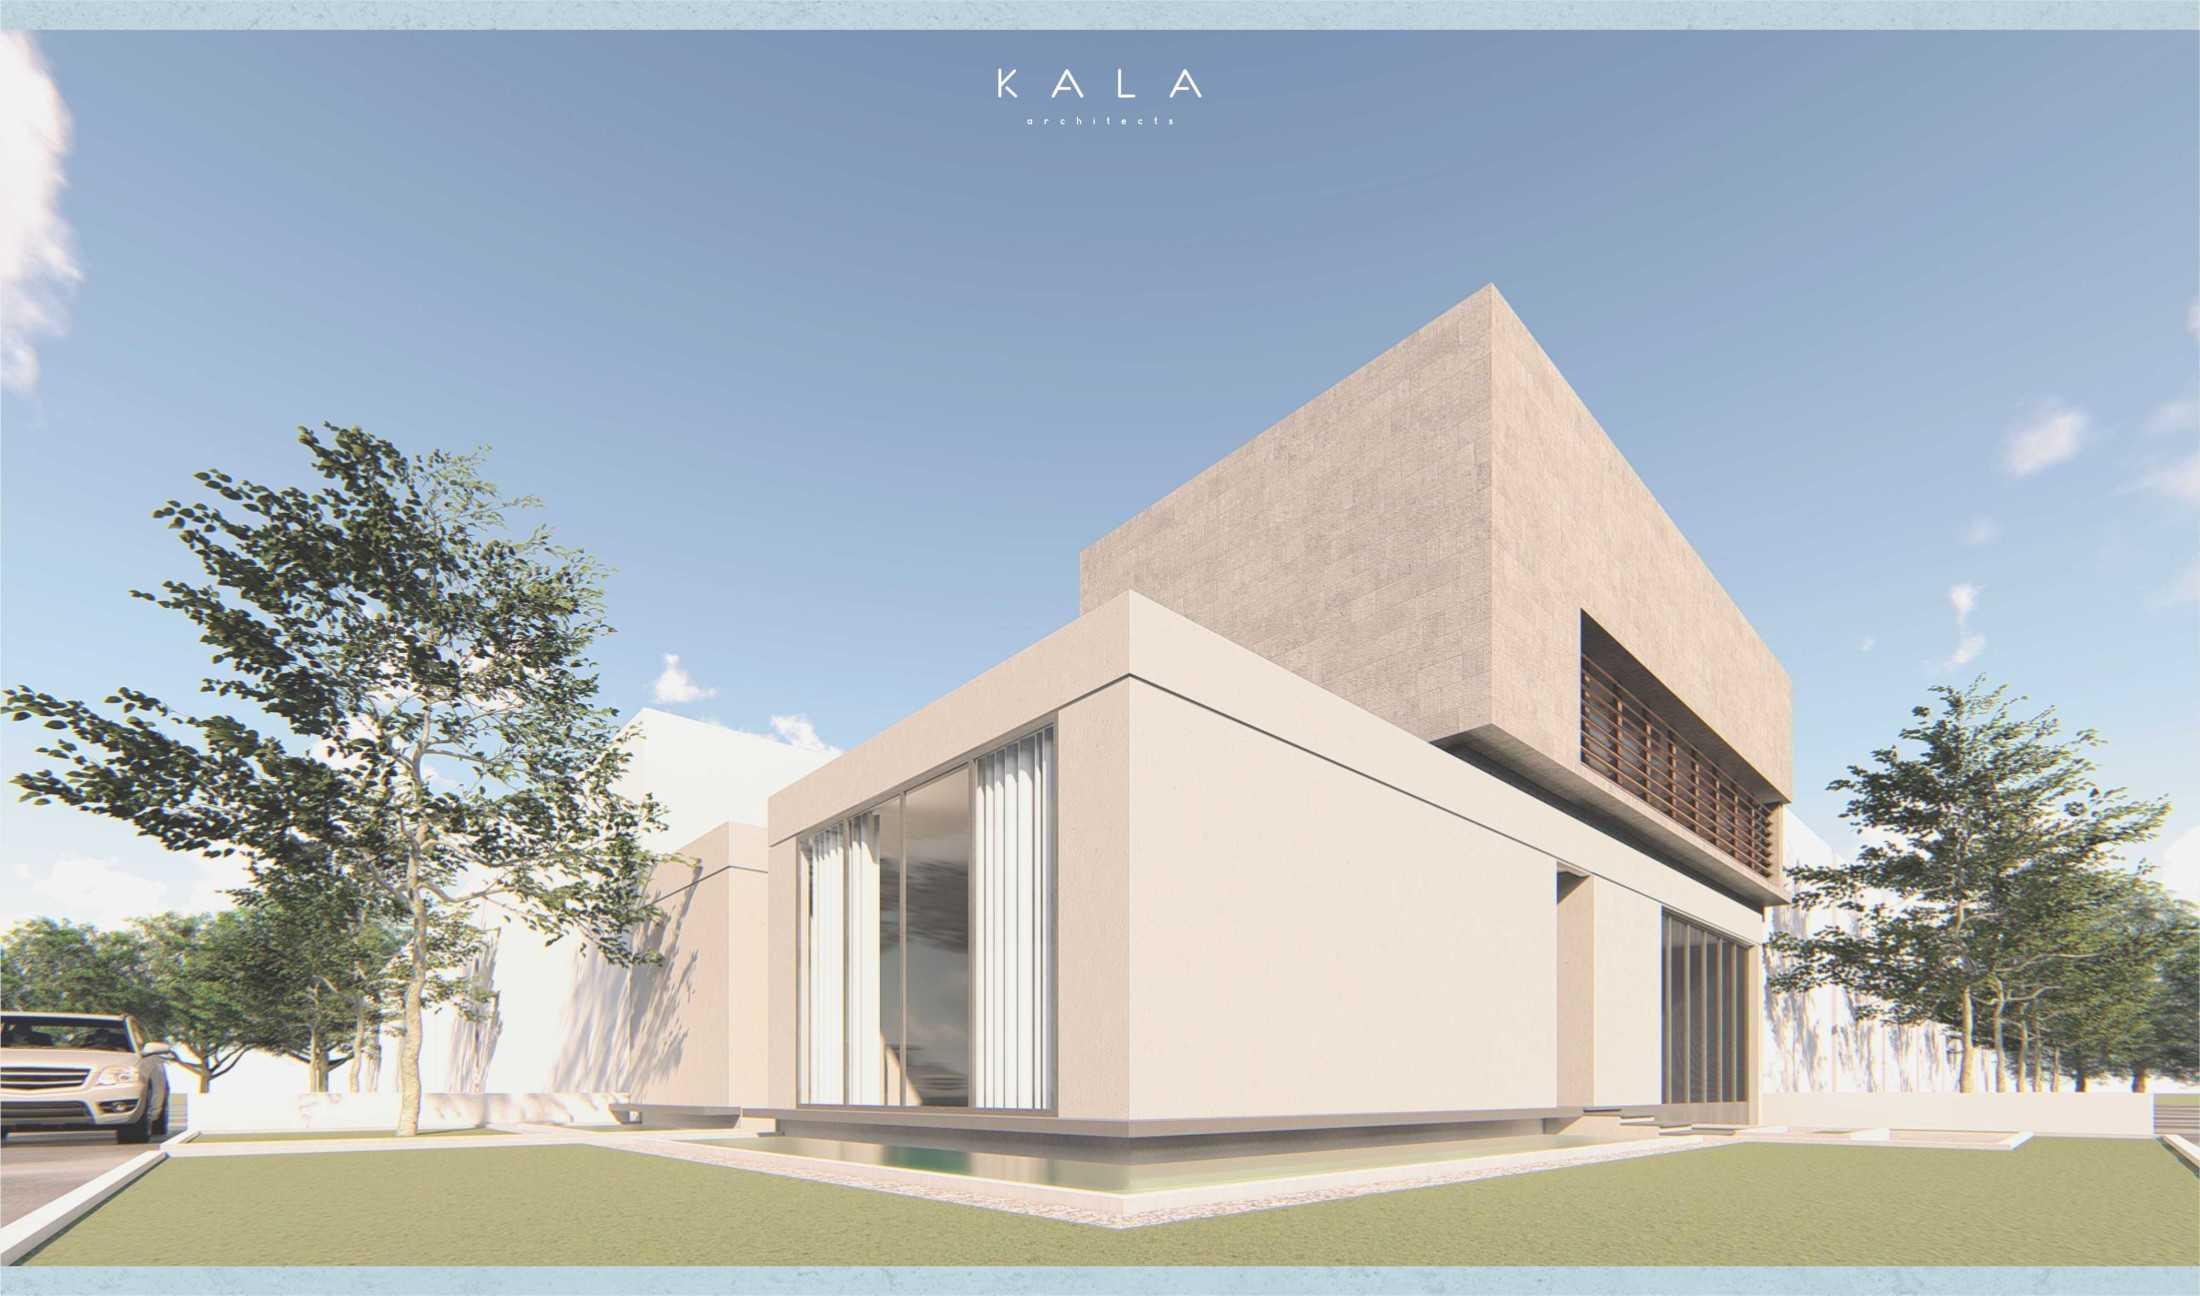 Kala M-House Kec. Serpong, Kota Tangerang Selatan, Banten, Indonesia Kec. Serpong, Kota Tangerang Selatan, Banten, Indonesia Kala-M-House  74467